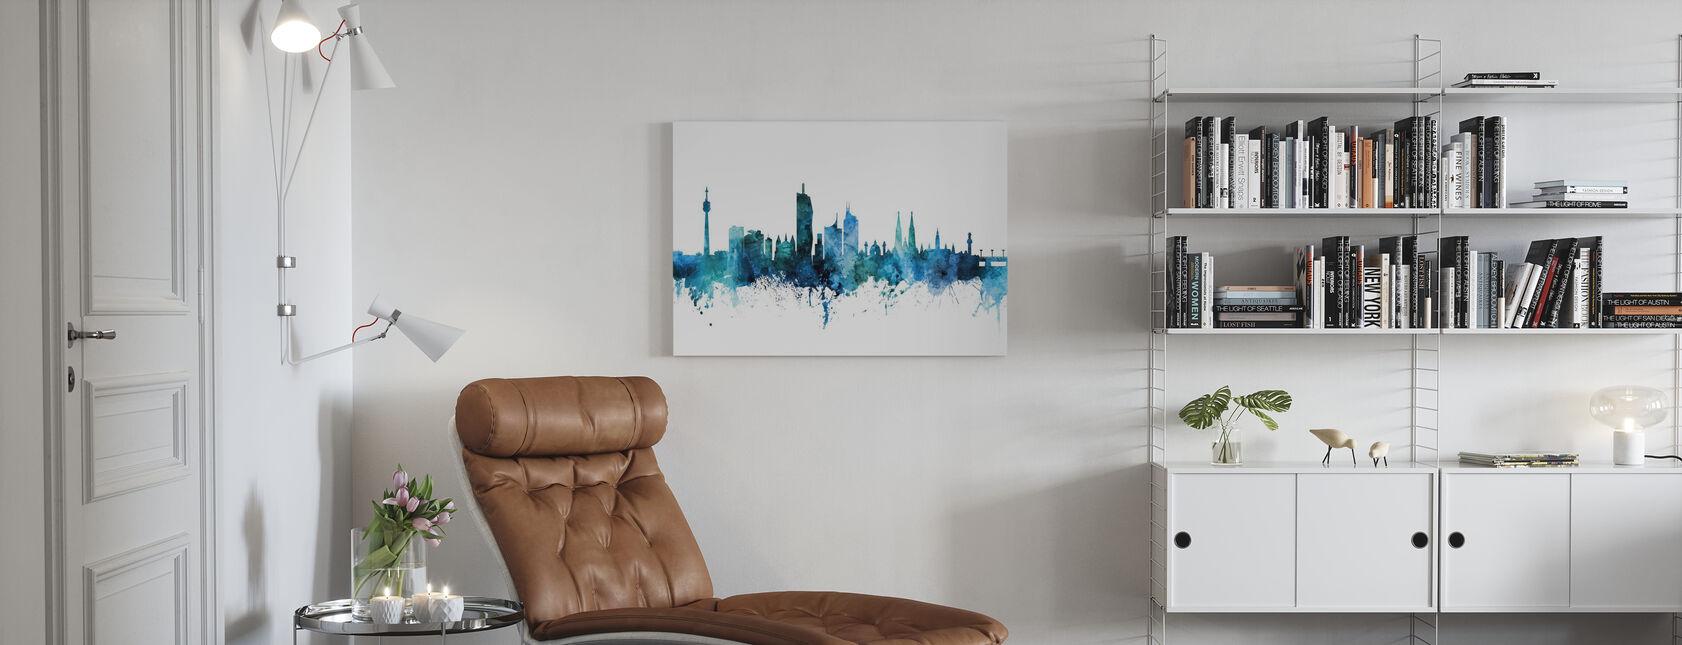 Wien Österrike Skyline - Canvastavla - Vardagsrum